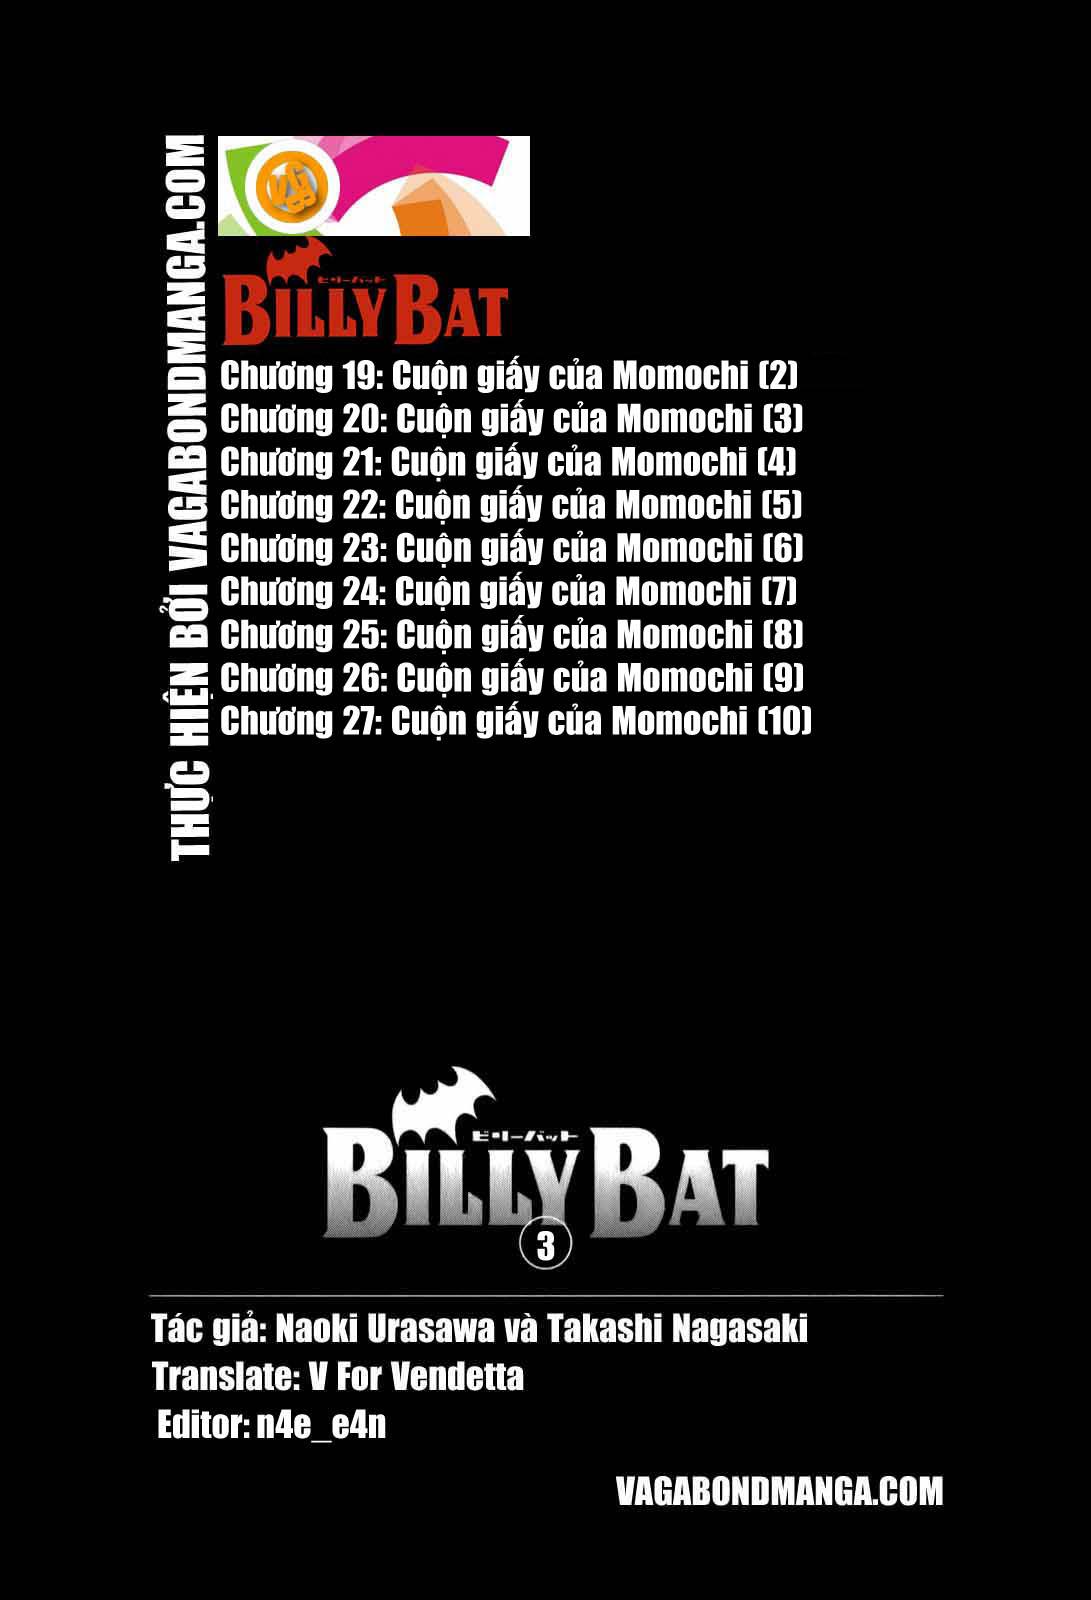 Billy Bat Chương 27